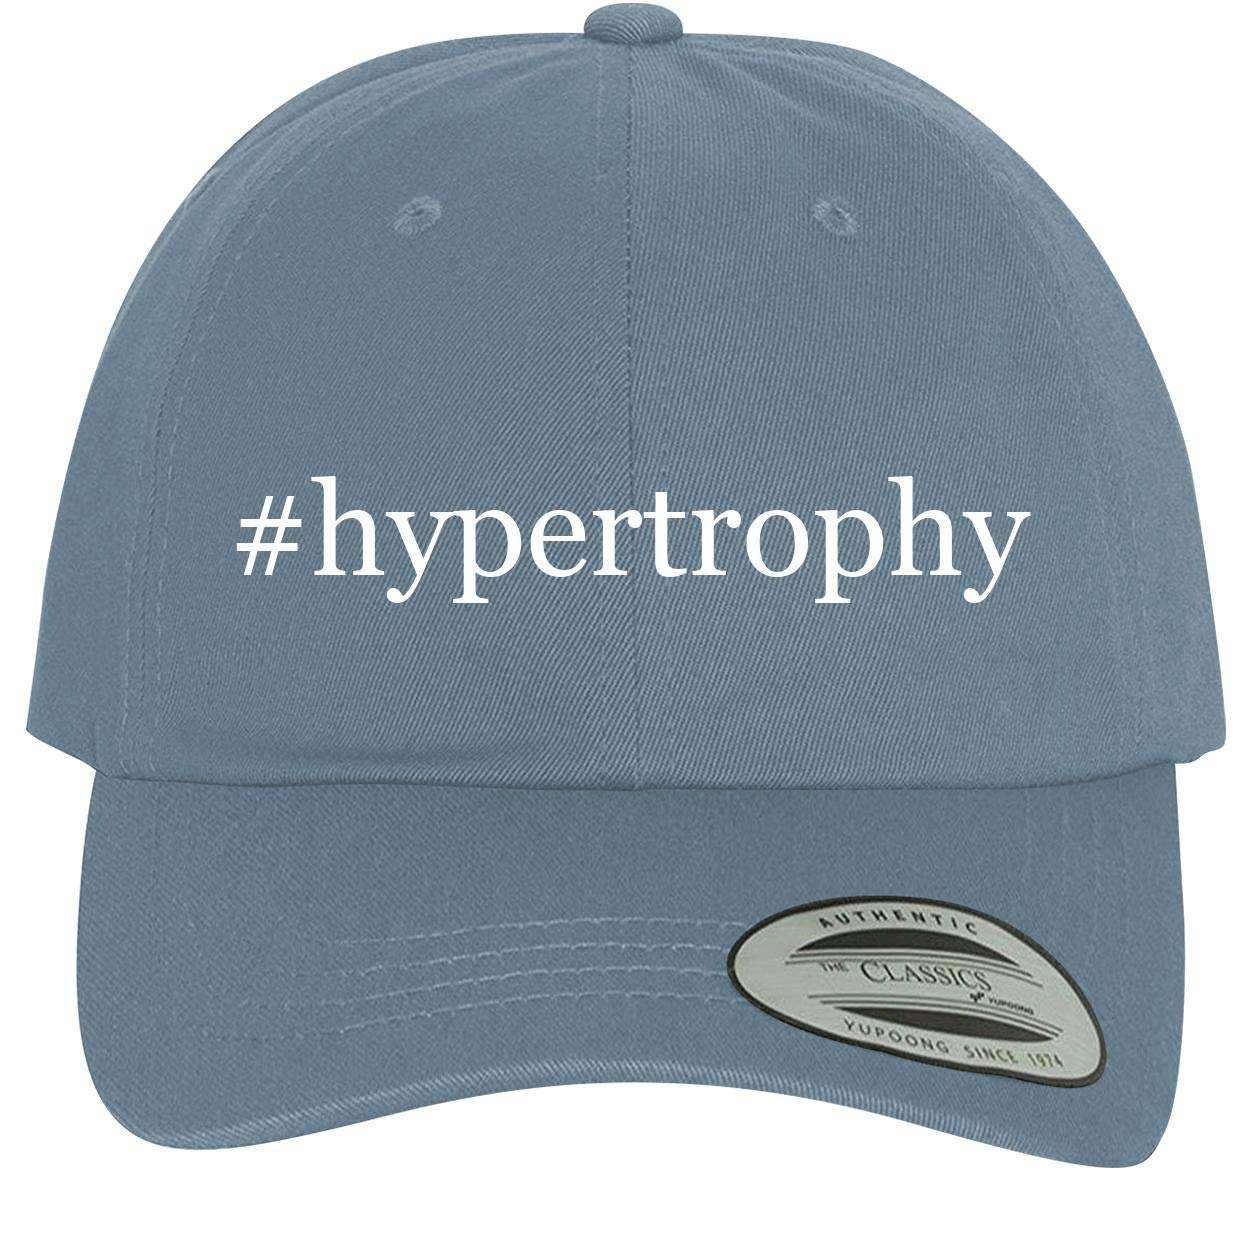 Comfortable Dad Hat Baseball Cap BH Cool Designs #Hypertrophy